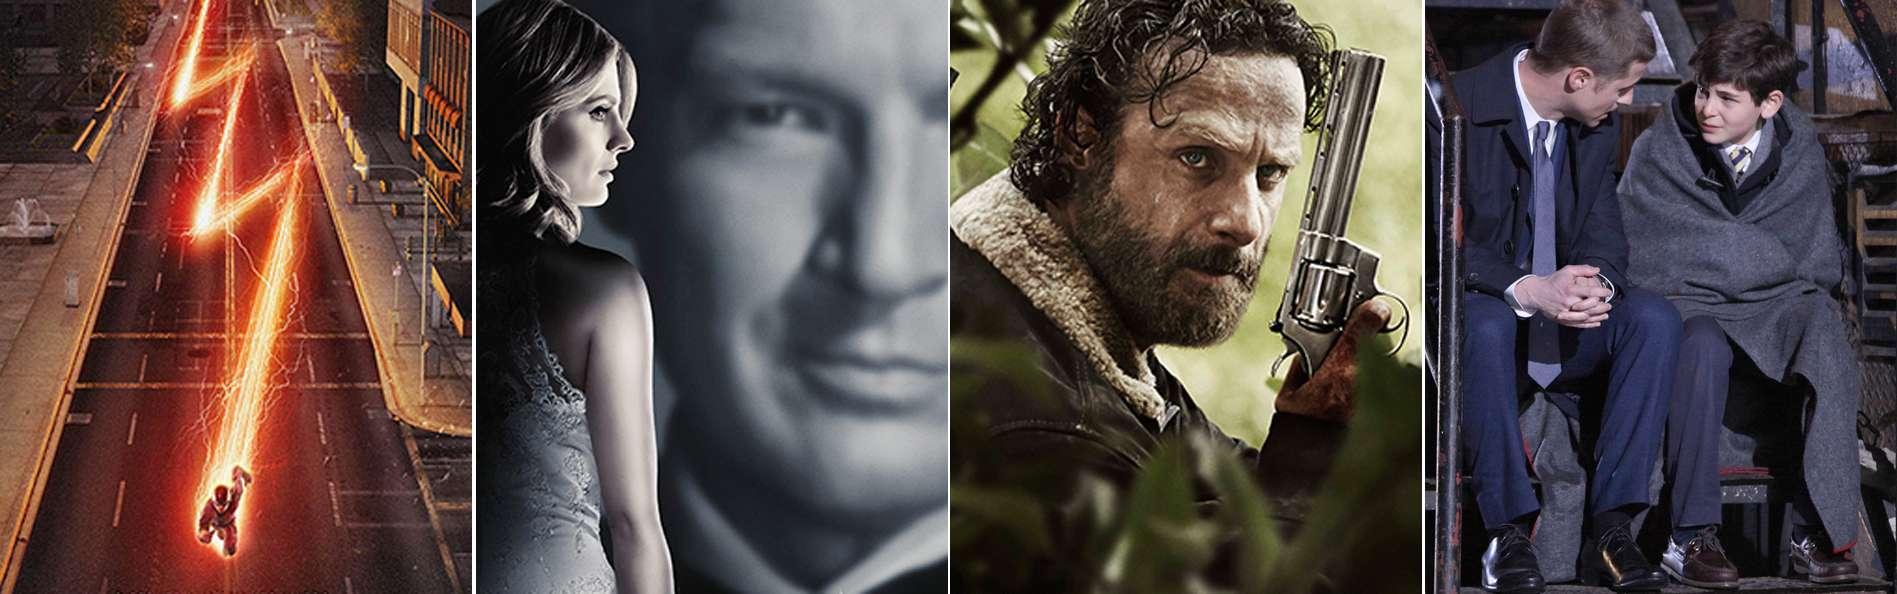 Estrenos de series 2014. Foto: CW / CBS / AMC